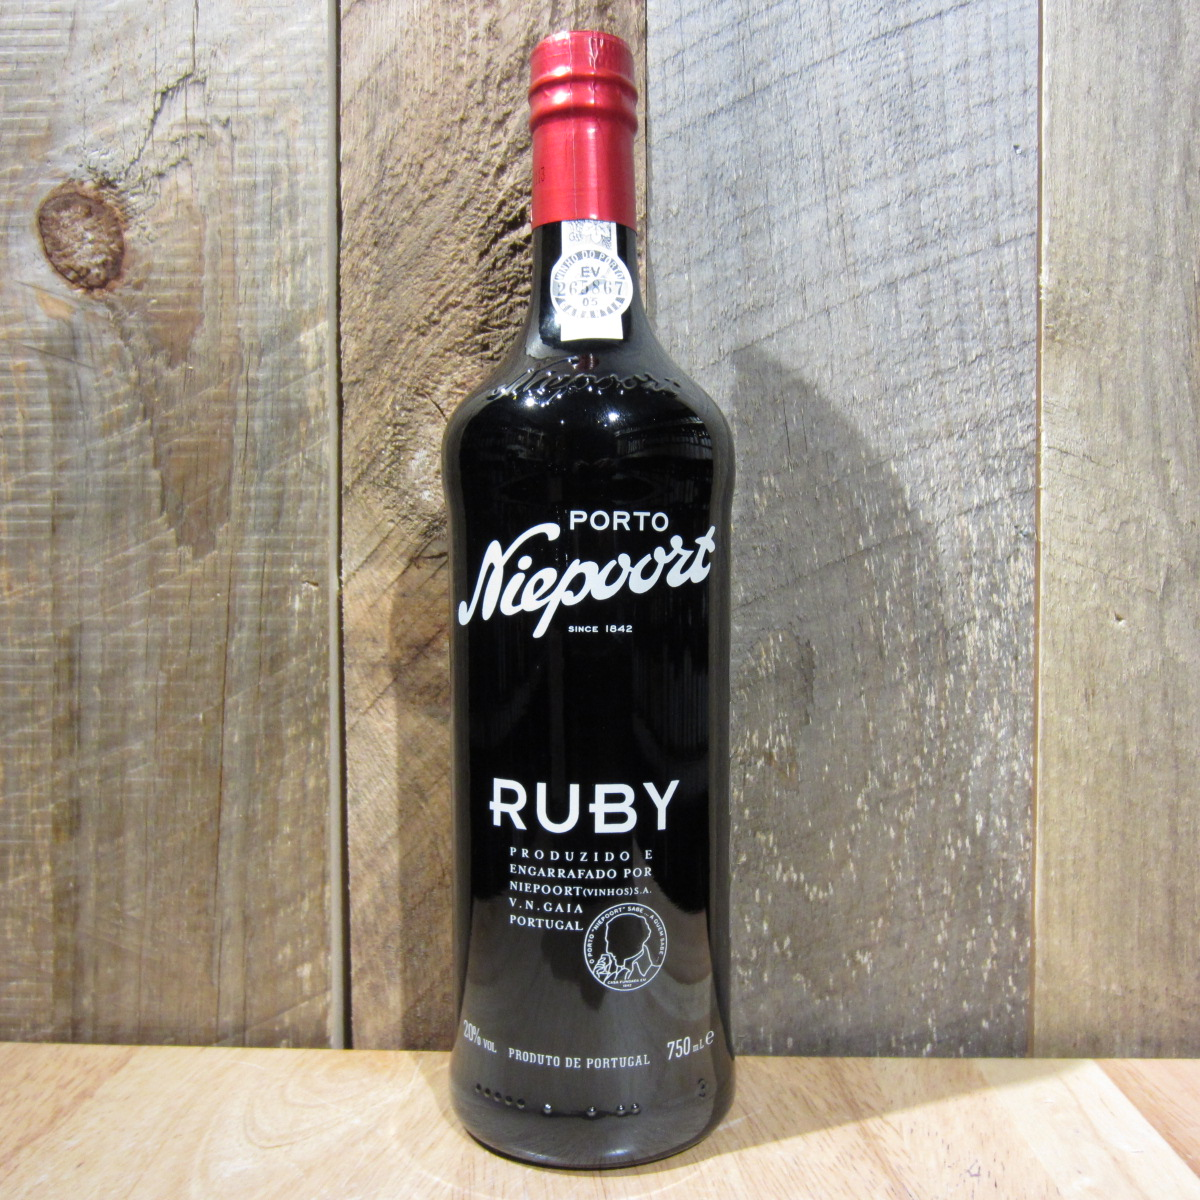 Niepoort Ruby Porto 750ml